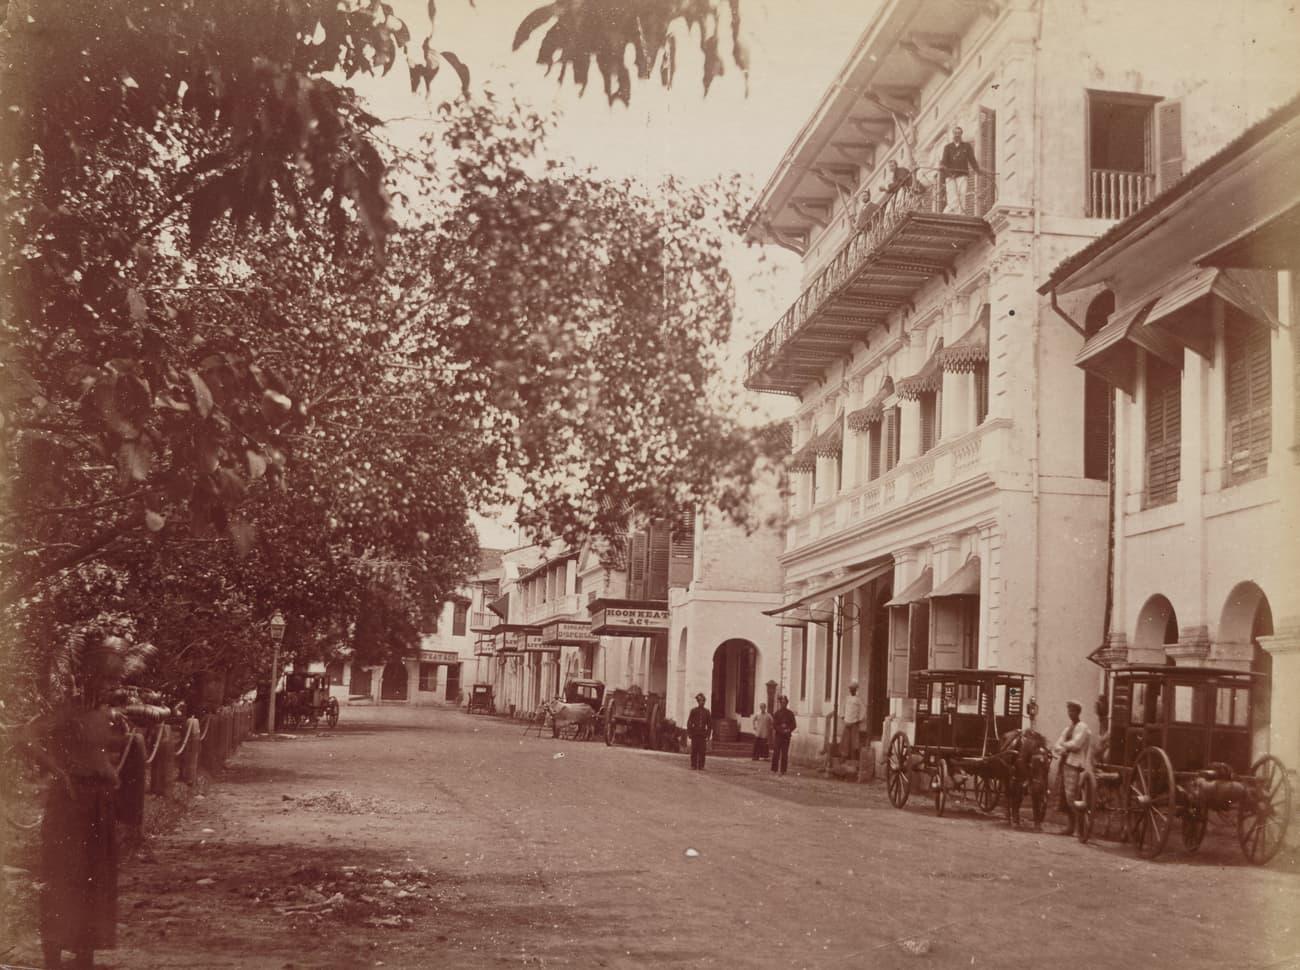 Raffles Place, 1880s